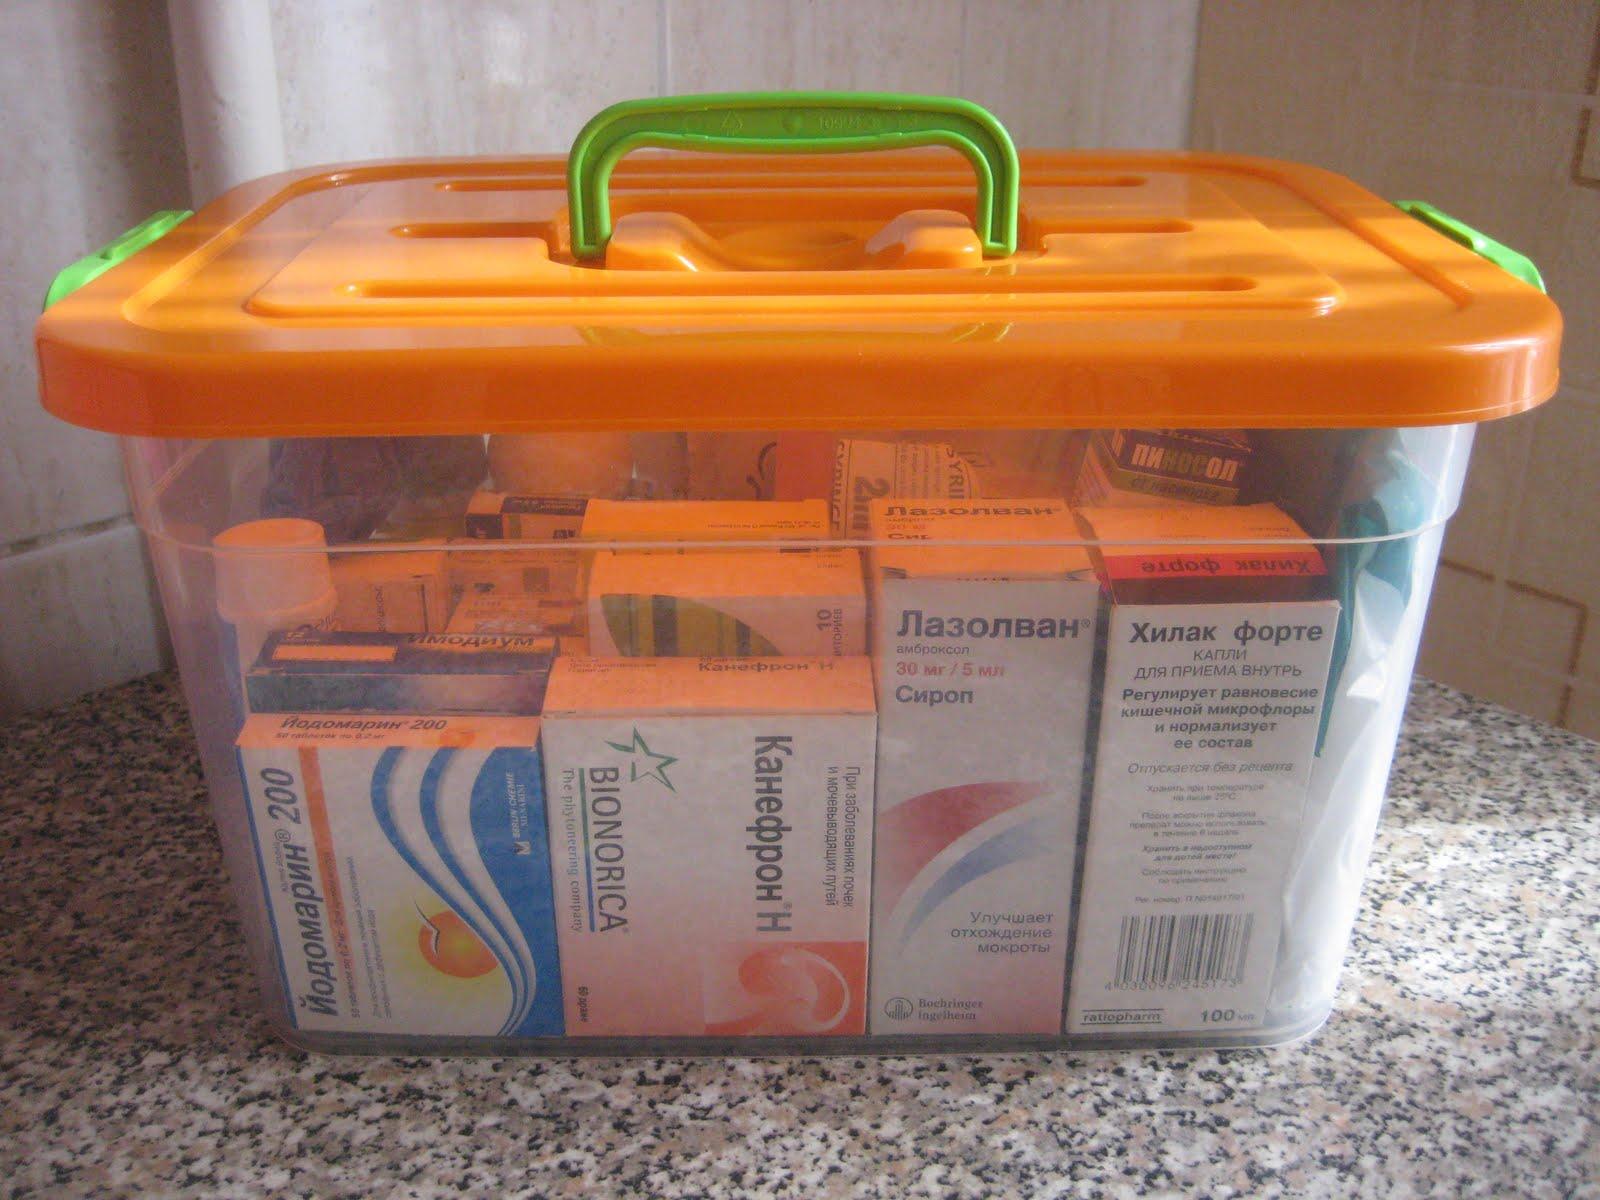 Хранение лекарств в коробке